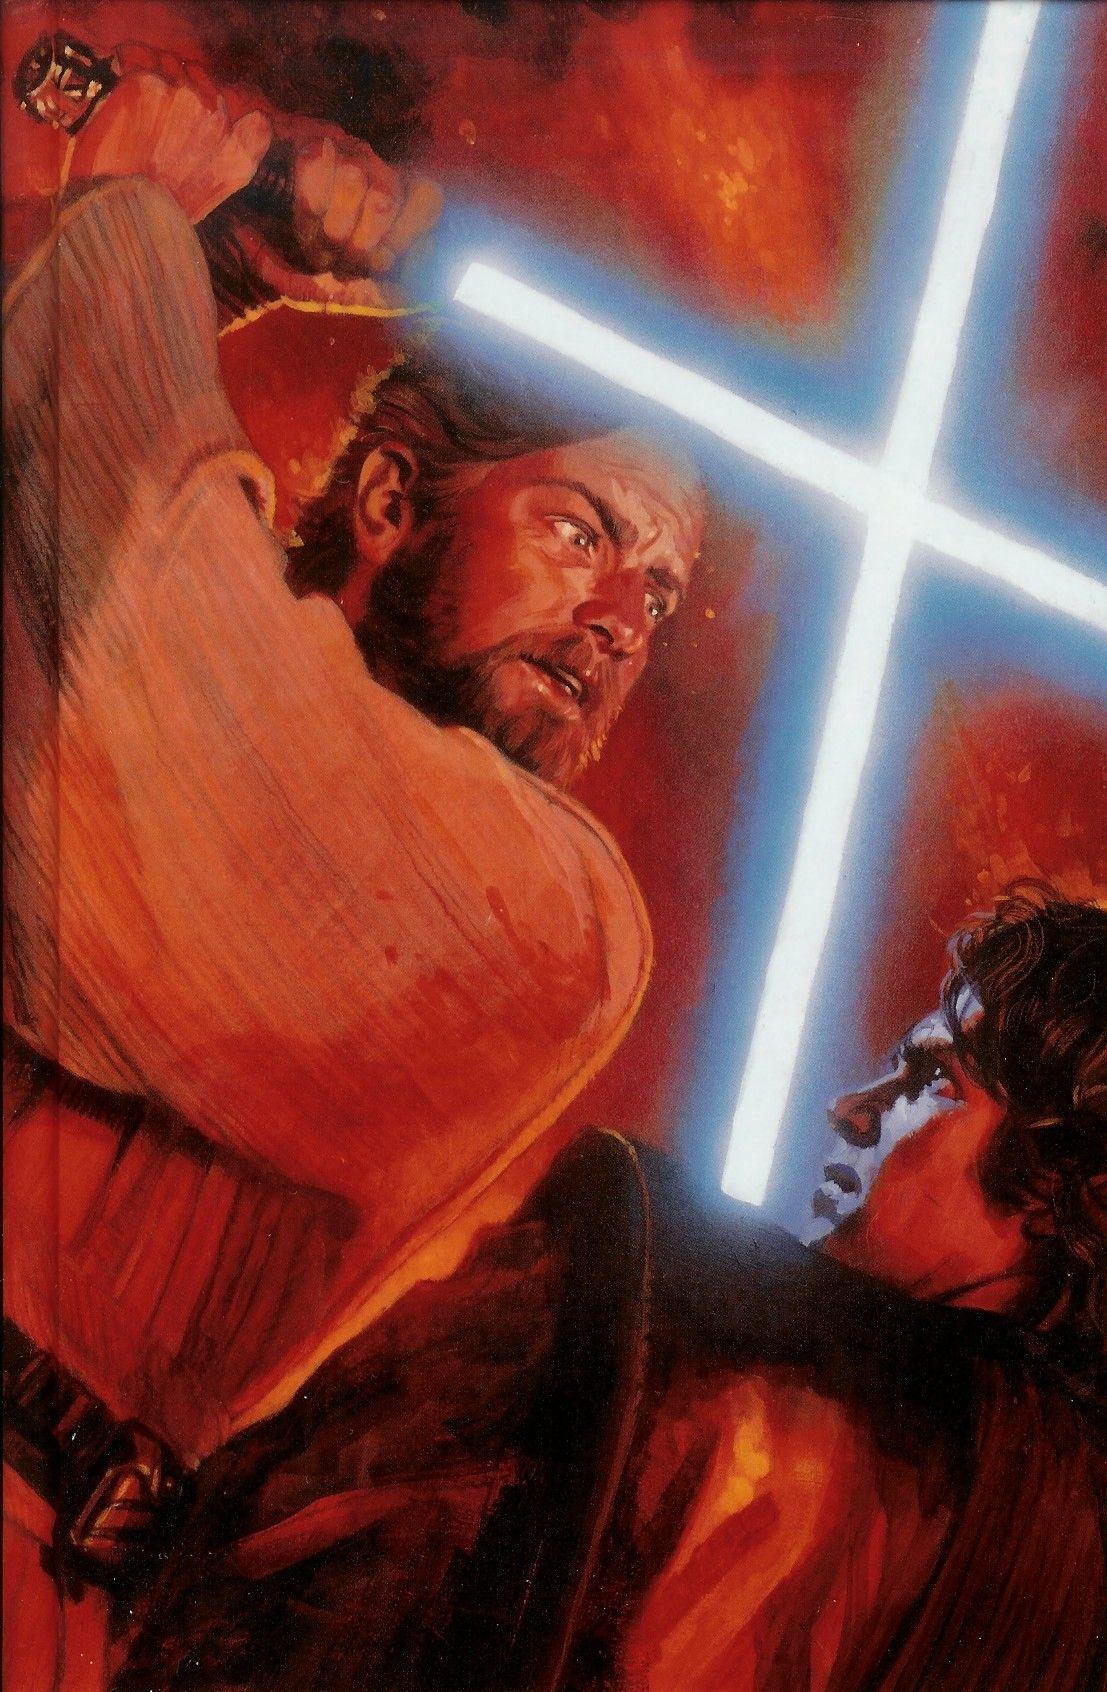 Kenobi And Skywalker On Mustafar Skywalker S Final Battle Before